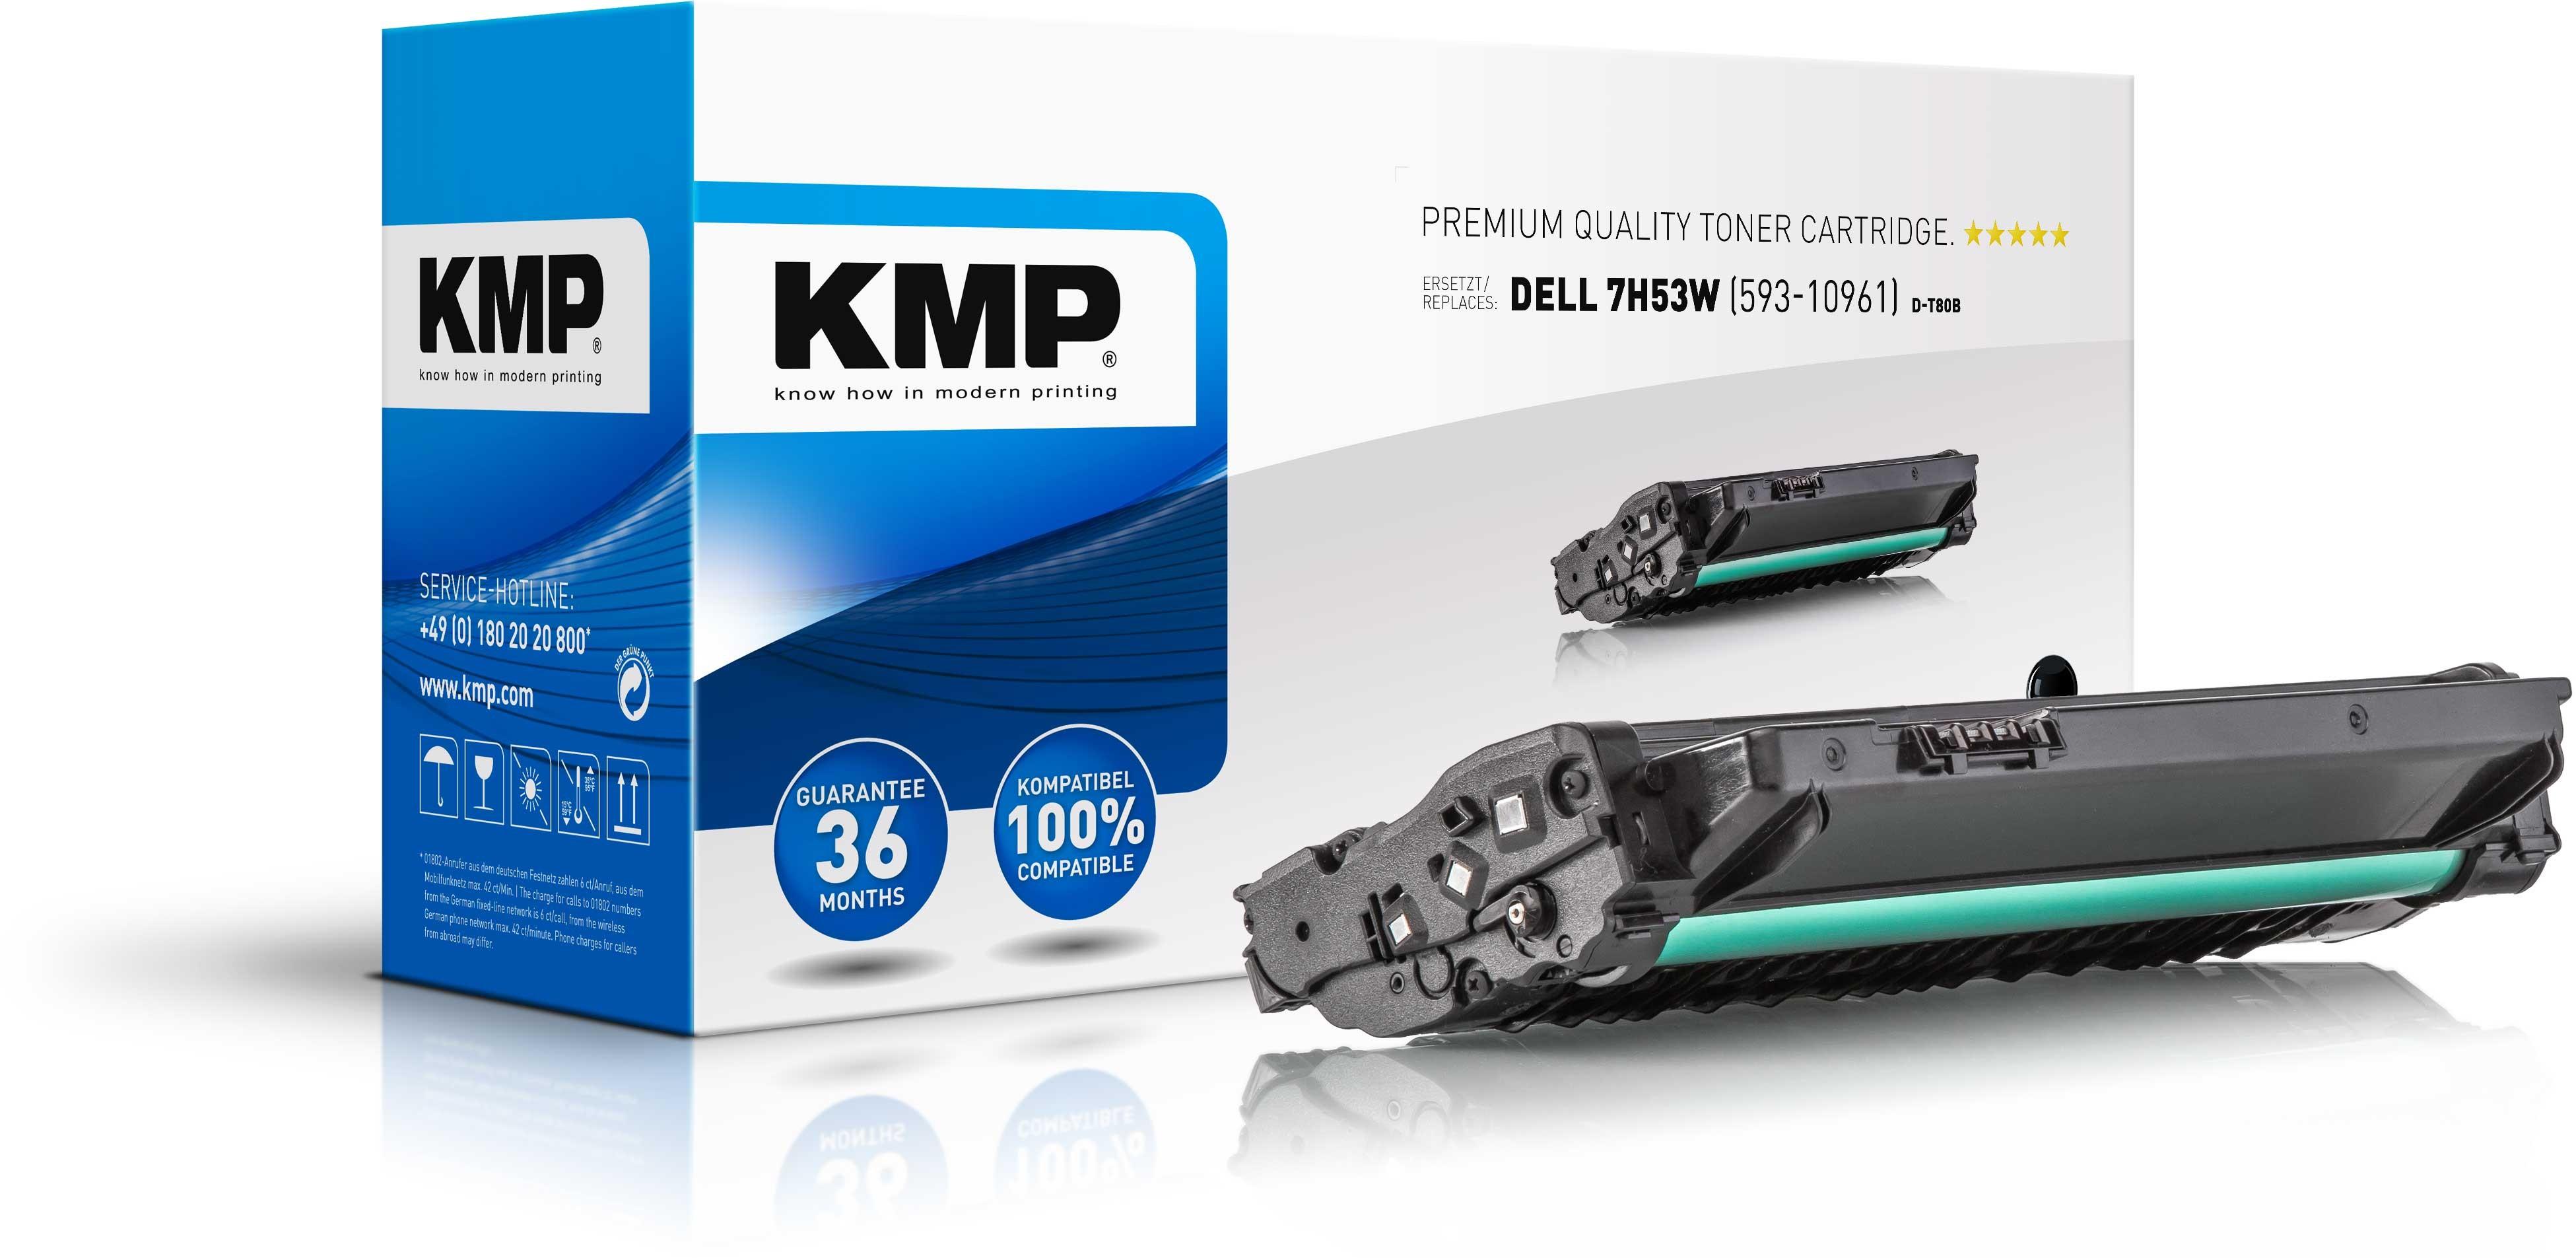 KMP Toner D-T80B für Dell 7H53W 1130 etc. Black